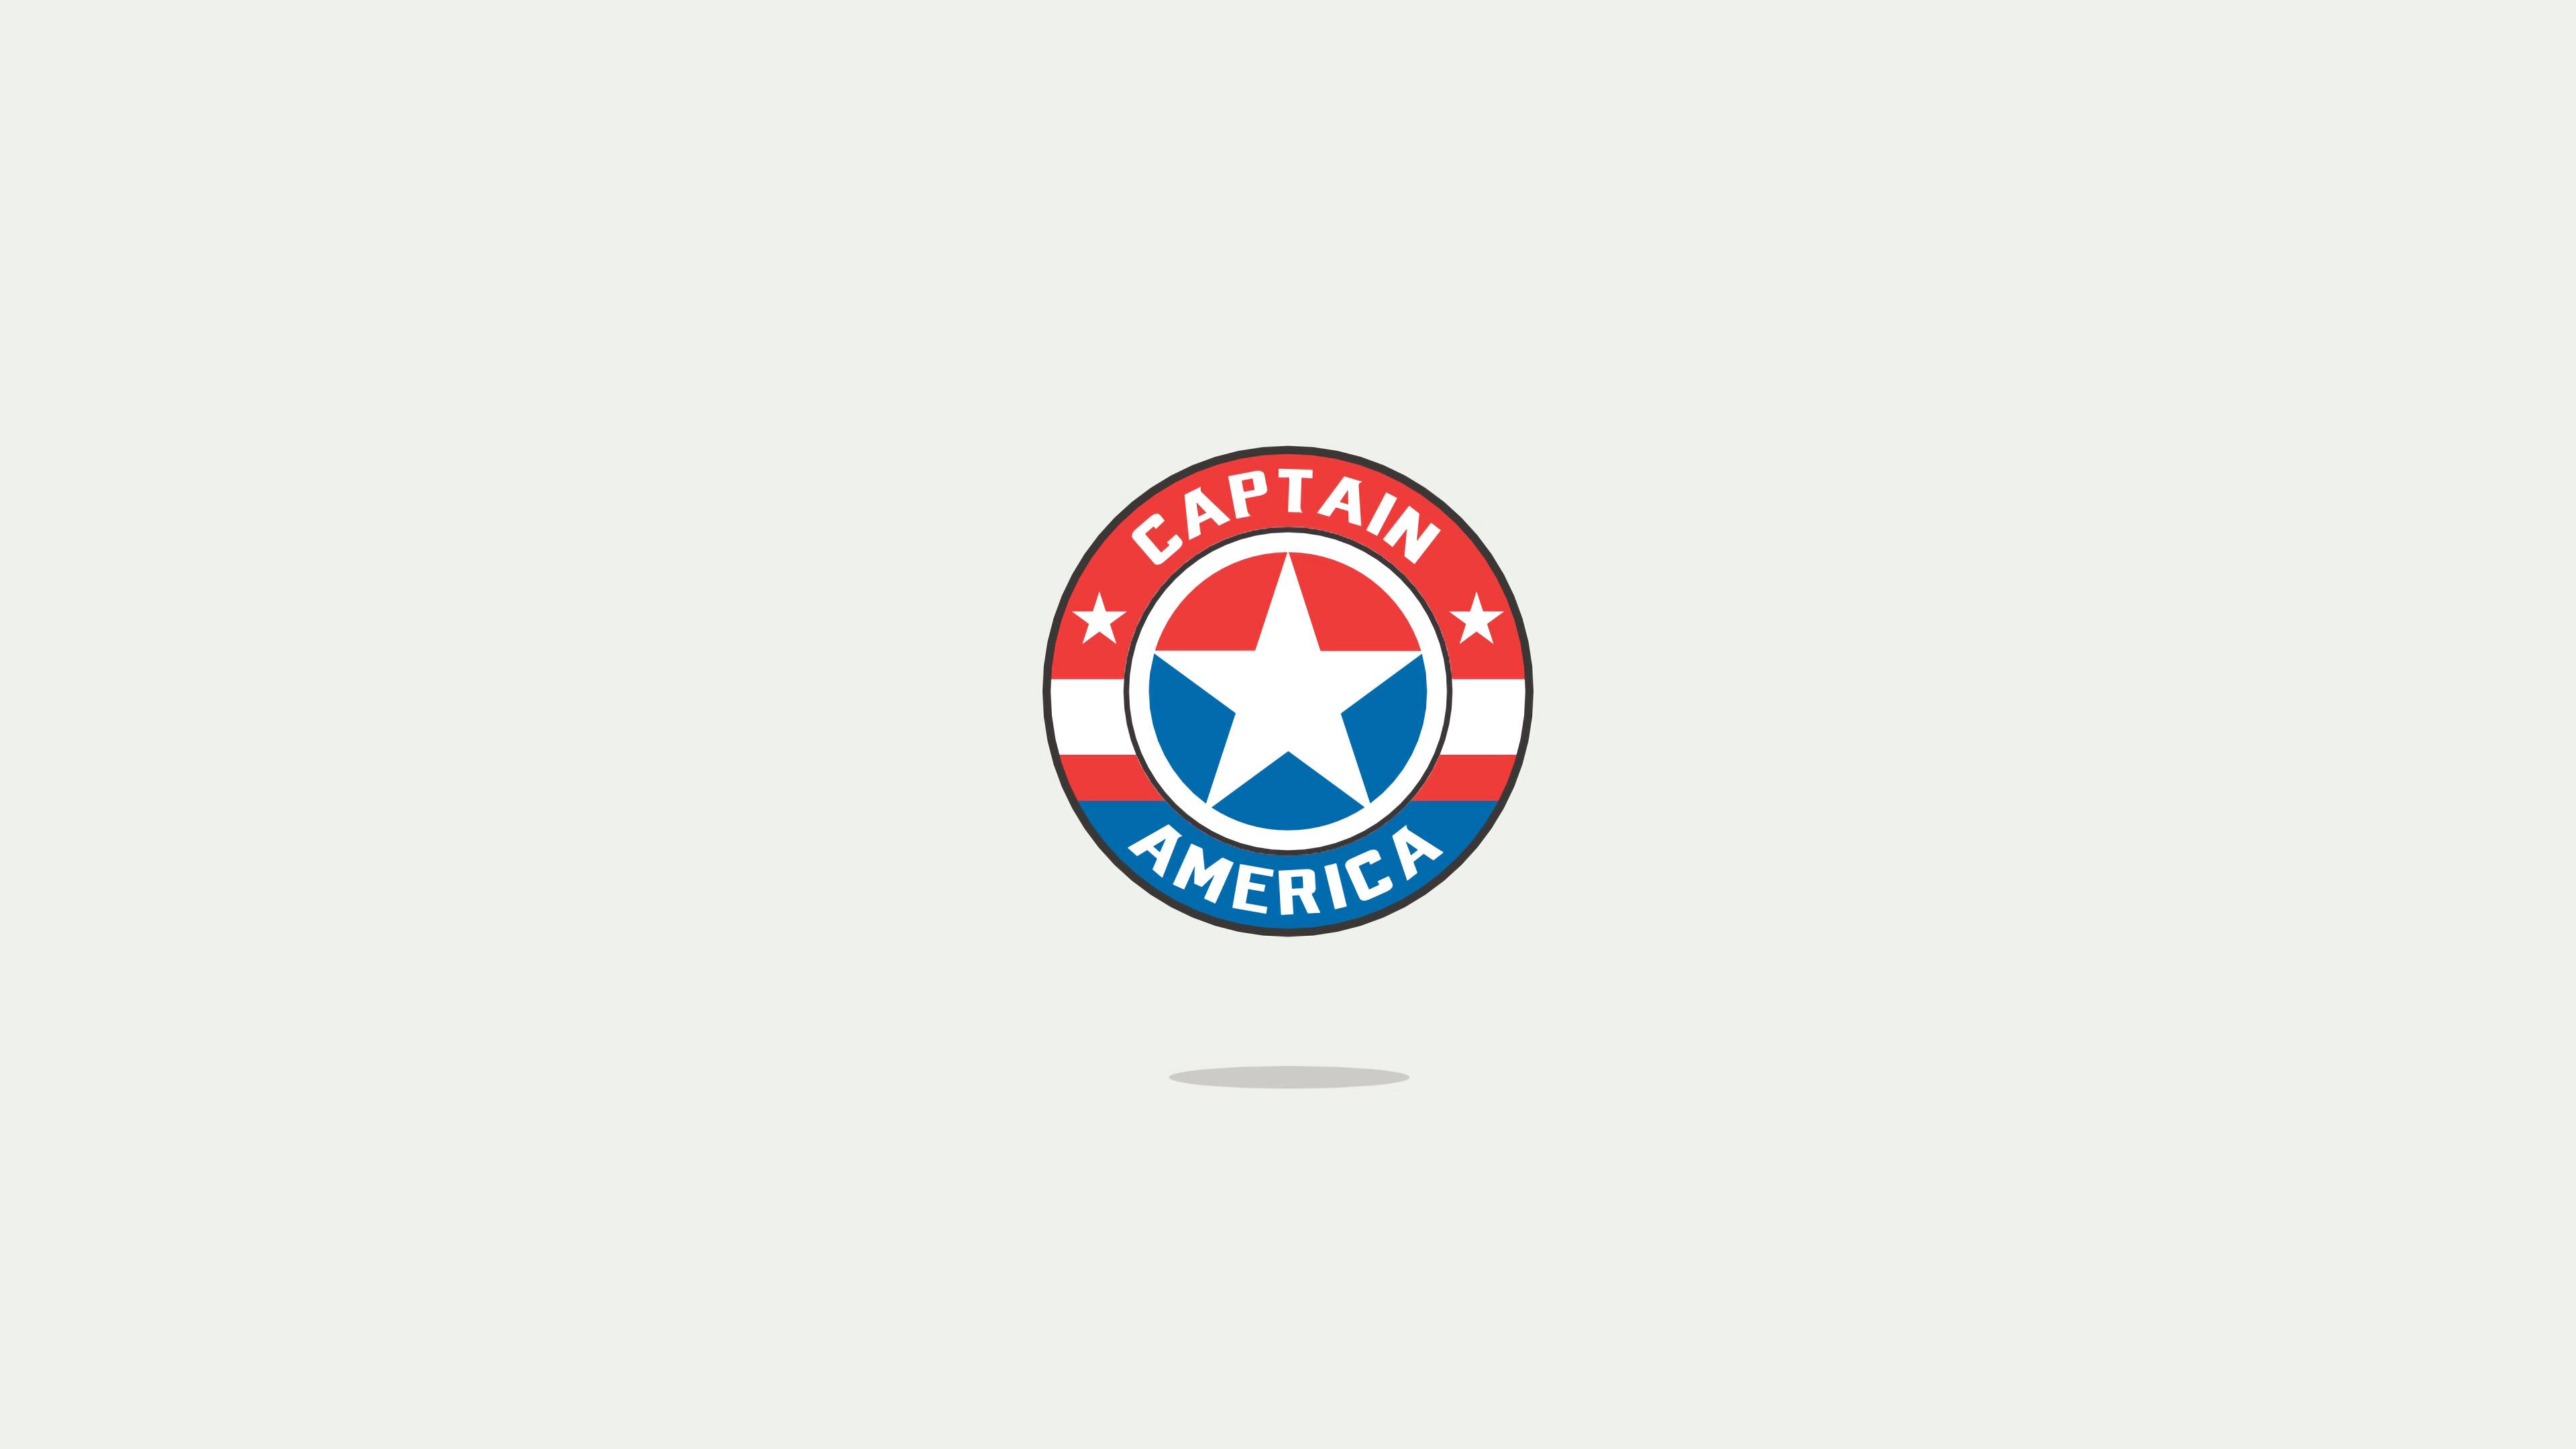 captain america minimal logo 1568055226 - Captain America Minimal Logo - superheroes wallpapers, minimalist wallpapers, minimalism wallpapers, hd-wallpapers, captain america wallpapers, behance wallpapers, 4k-wallpapers